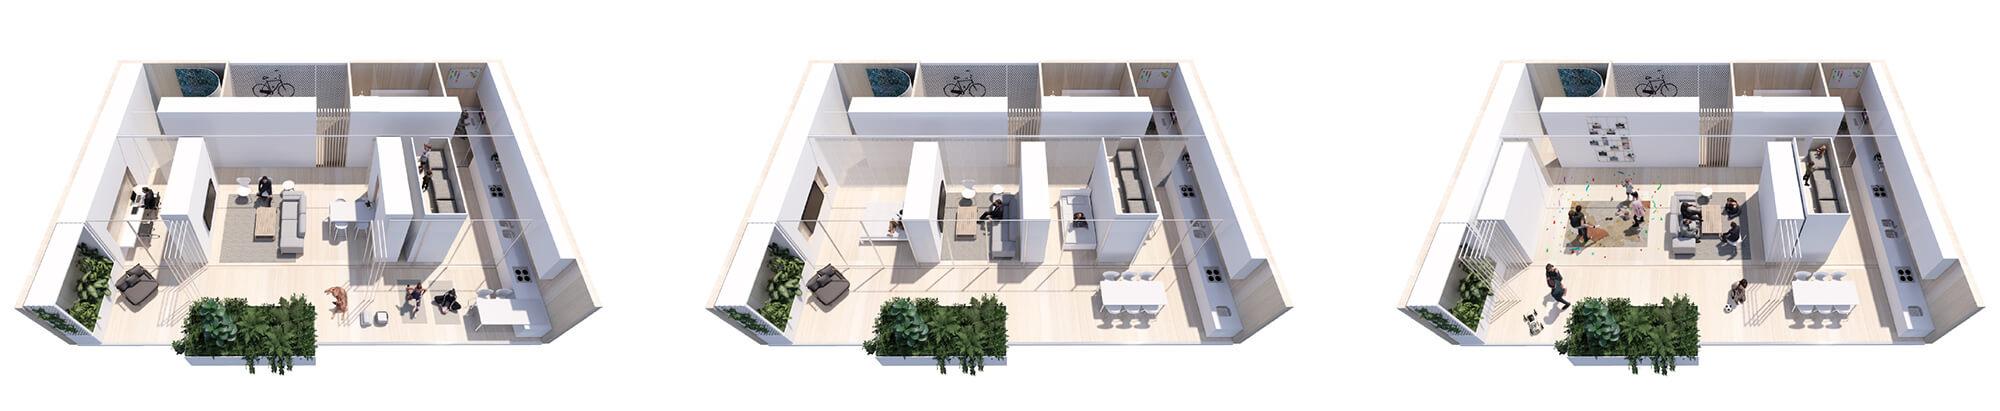 "architecture 2020 Woods Bagot's ""AD-APT"" proposal"